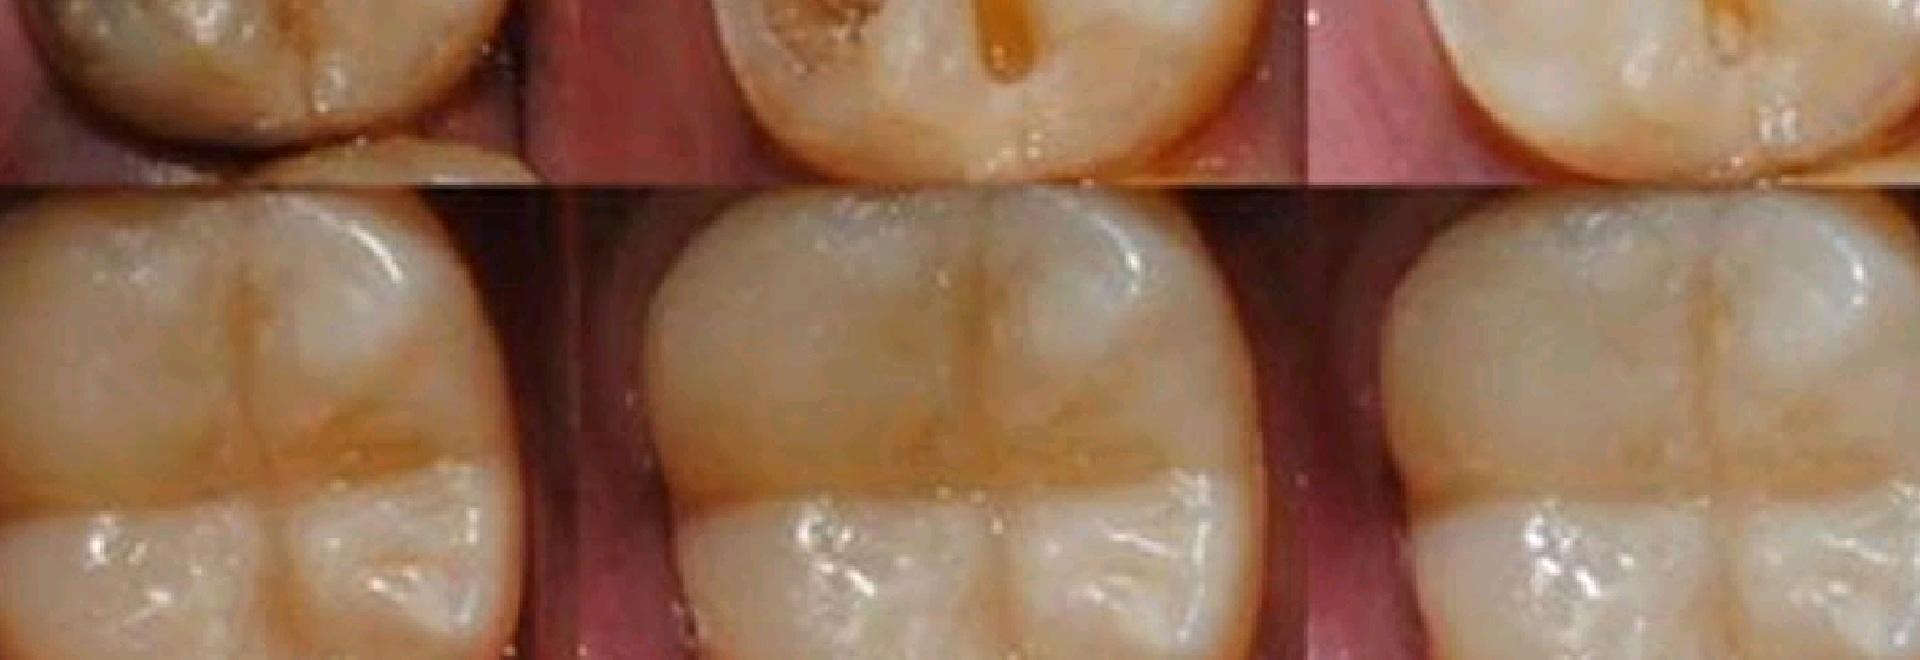 Scientists found a way to regrow precious tooth enamel